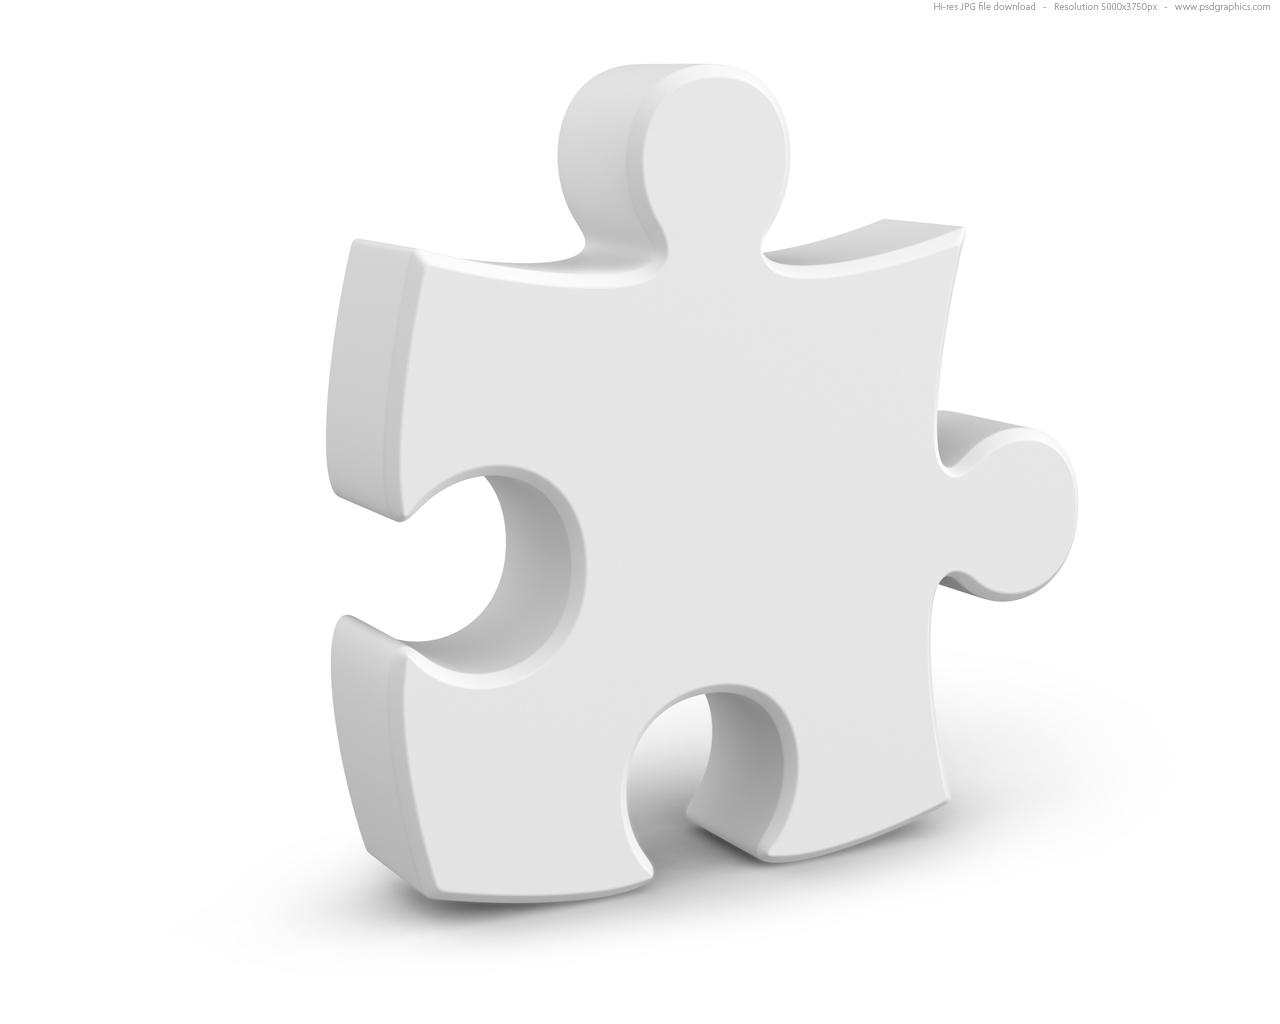 Single jigsaw puzzle piece, 3D symbol | PSDGraphics